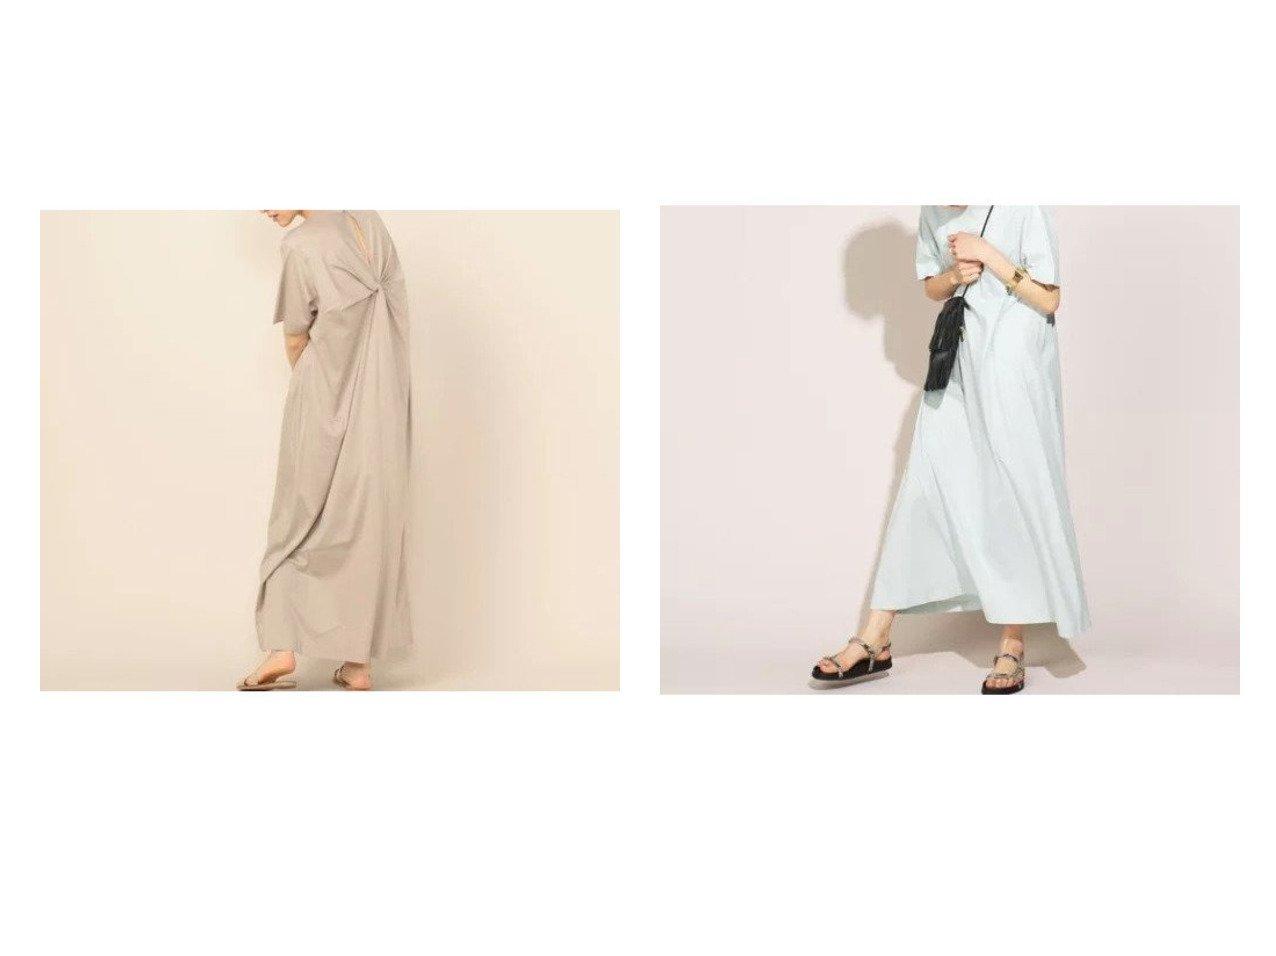 【Rie Miller/リエミラー】のスムースボンディングヘムAラインワンピース 【ワンピース・ドレス】おすすめ!人気、トレンド・レディースファッションの通販 おすすめファッション通販アイテム インテリア・キッズ・メンズ・レディースファッション・服の通販 founy(ファニー)  ファッション Fashion レディースファッション WOMEN ワンピース Dress Aラインワンピース A-line Dress シンプル ドレープ フェミニン 半袖 ブラウン系 Brown グリーン系 Green ブラック系 Black |ID:crp329100000037698